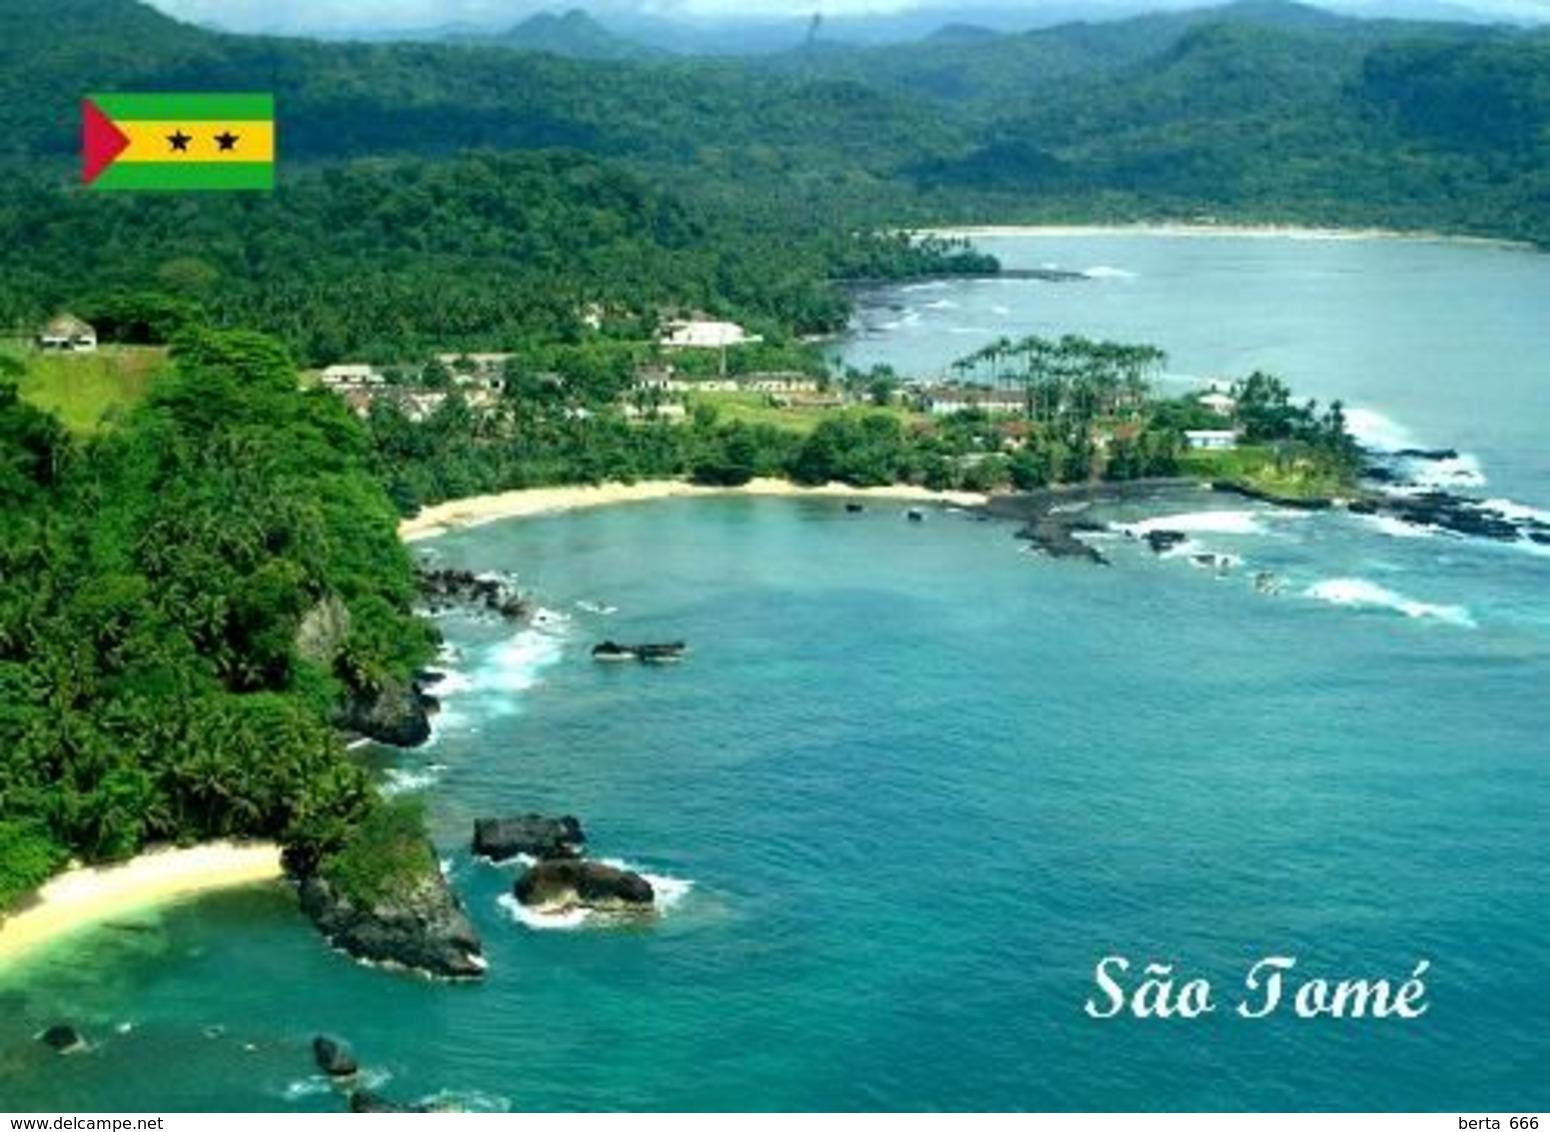 Sao Tome And Principe Islands Aerial View New Postcard - Sao Tome En Principe